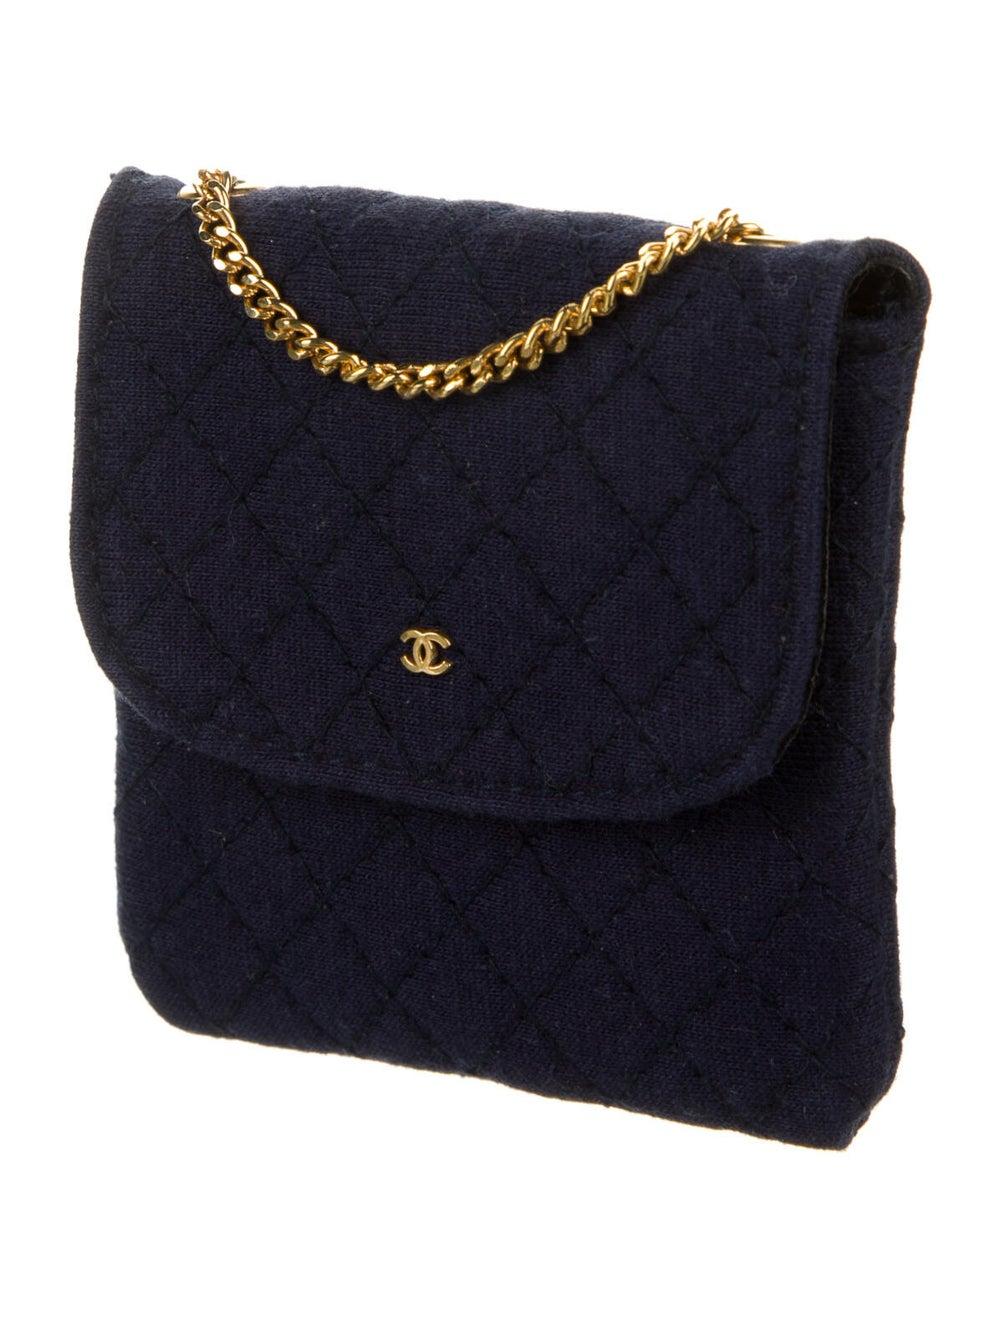 Chanel Vintage Jersey Micro Flap Bag Blue - image 3